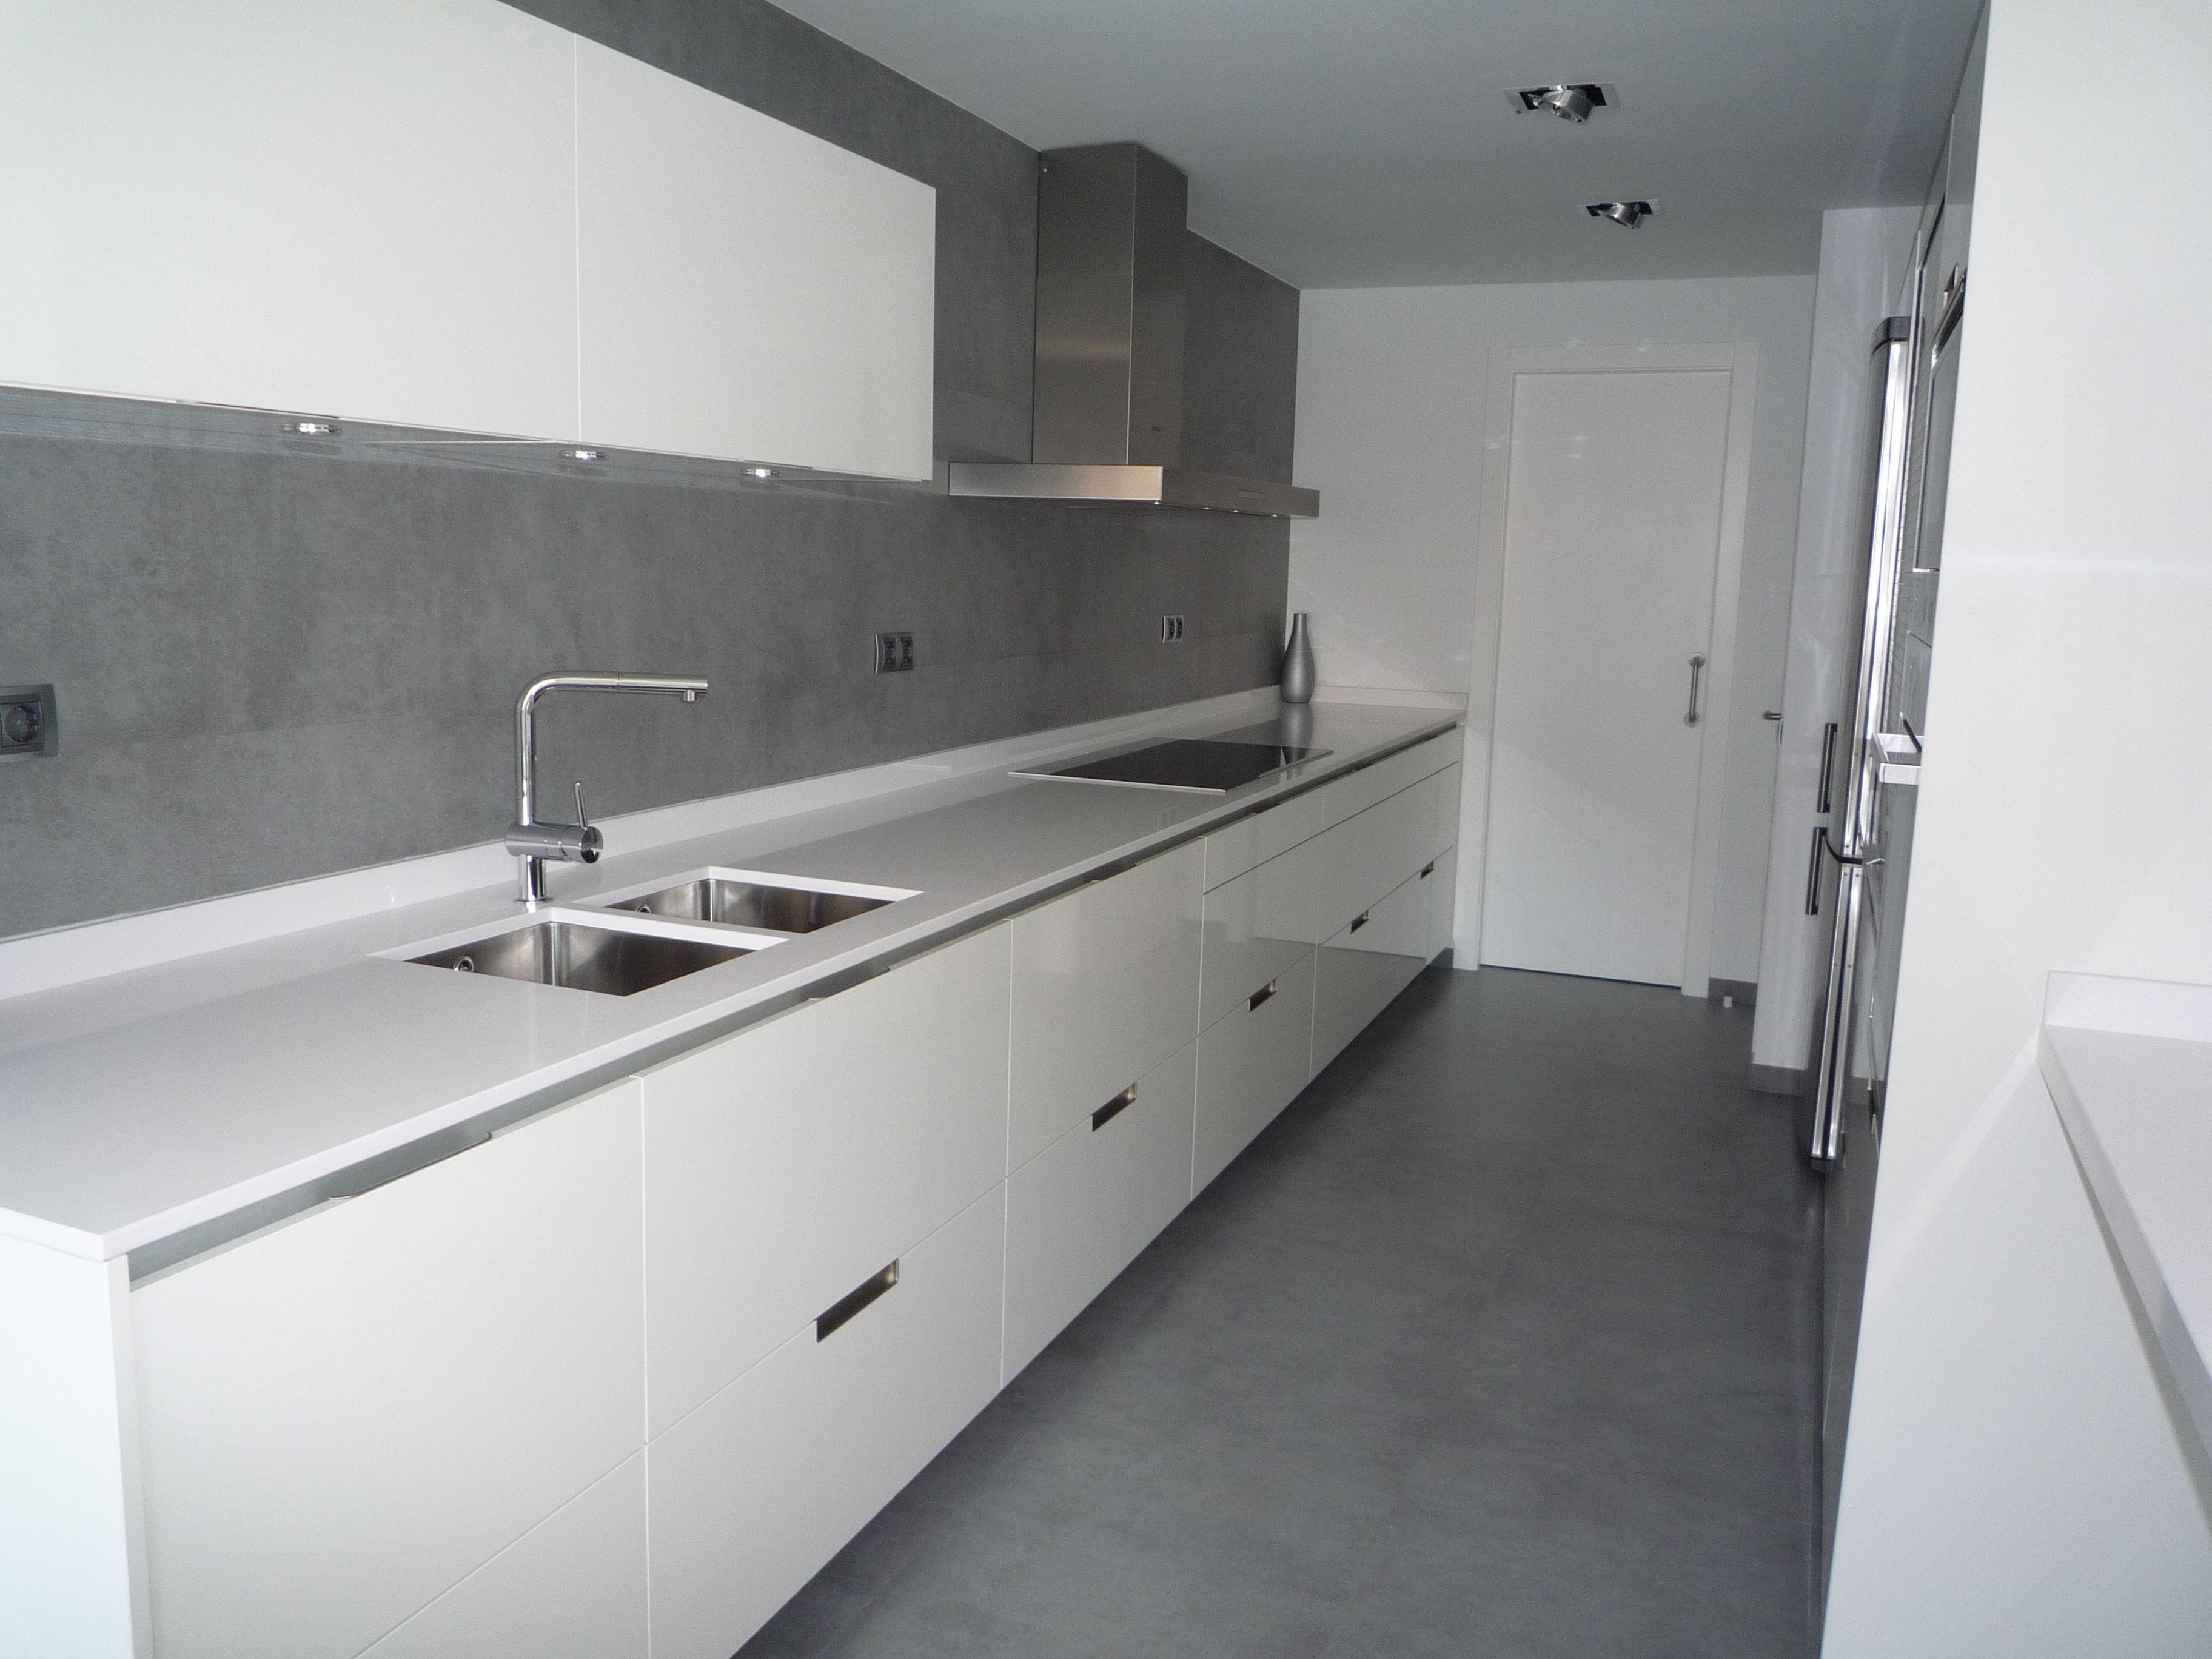 Pin de sonia isabel lopez en cocina en 2019 kitchen for Cocina de madera antracita